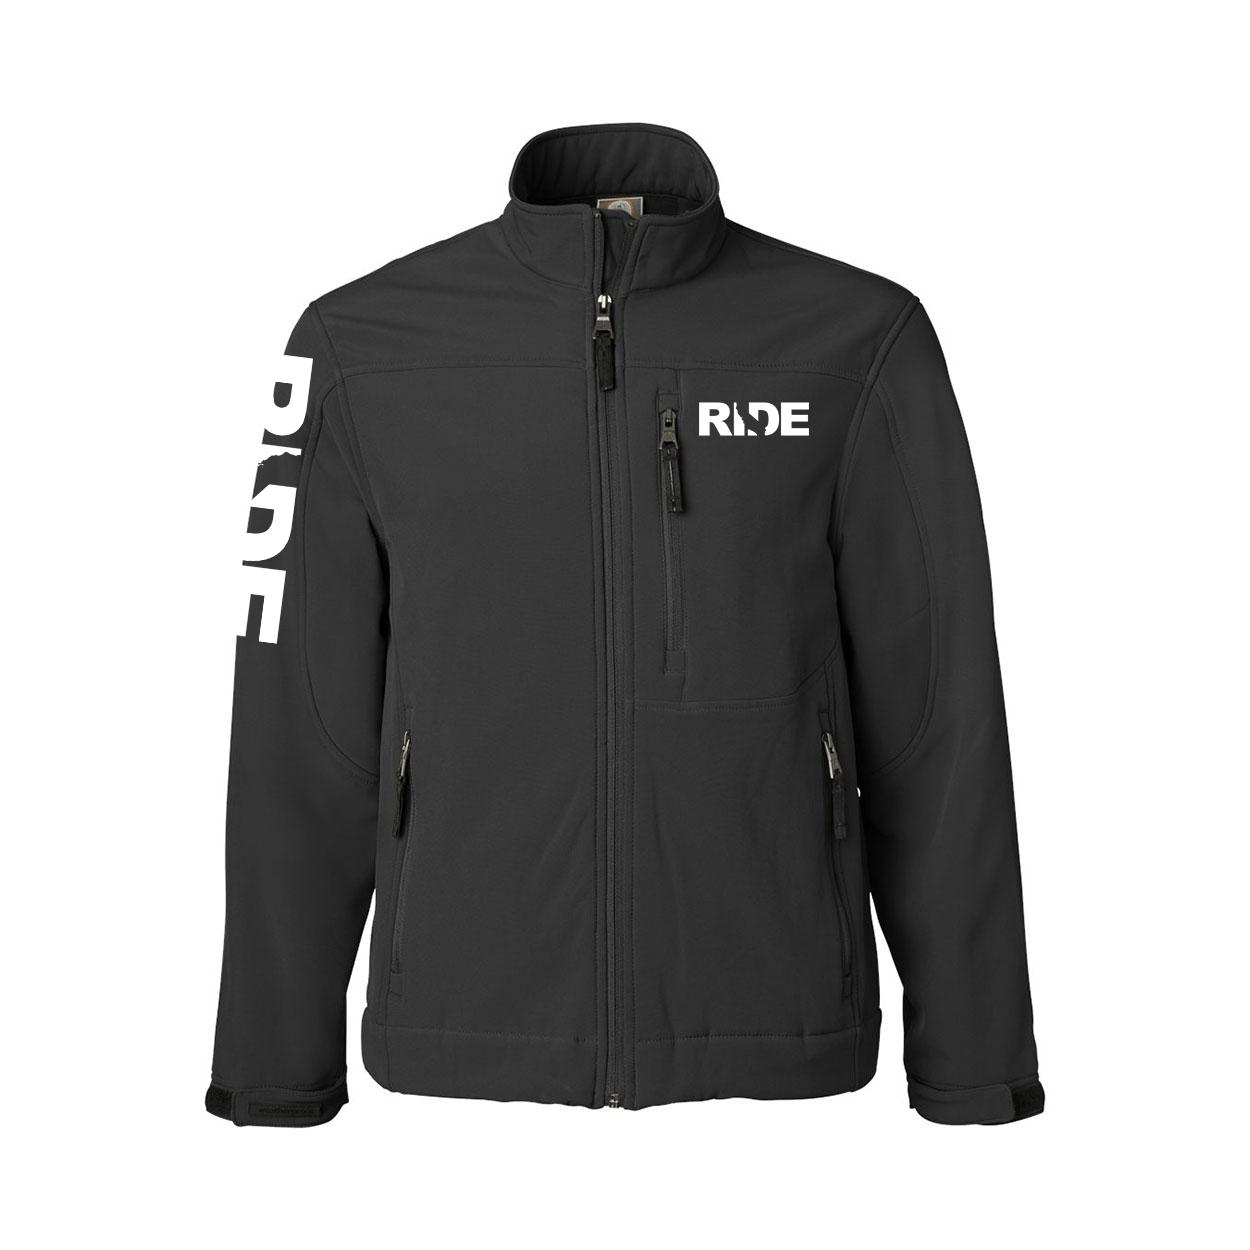 Ride California Classic Soft Shell Weatherproof Jacket